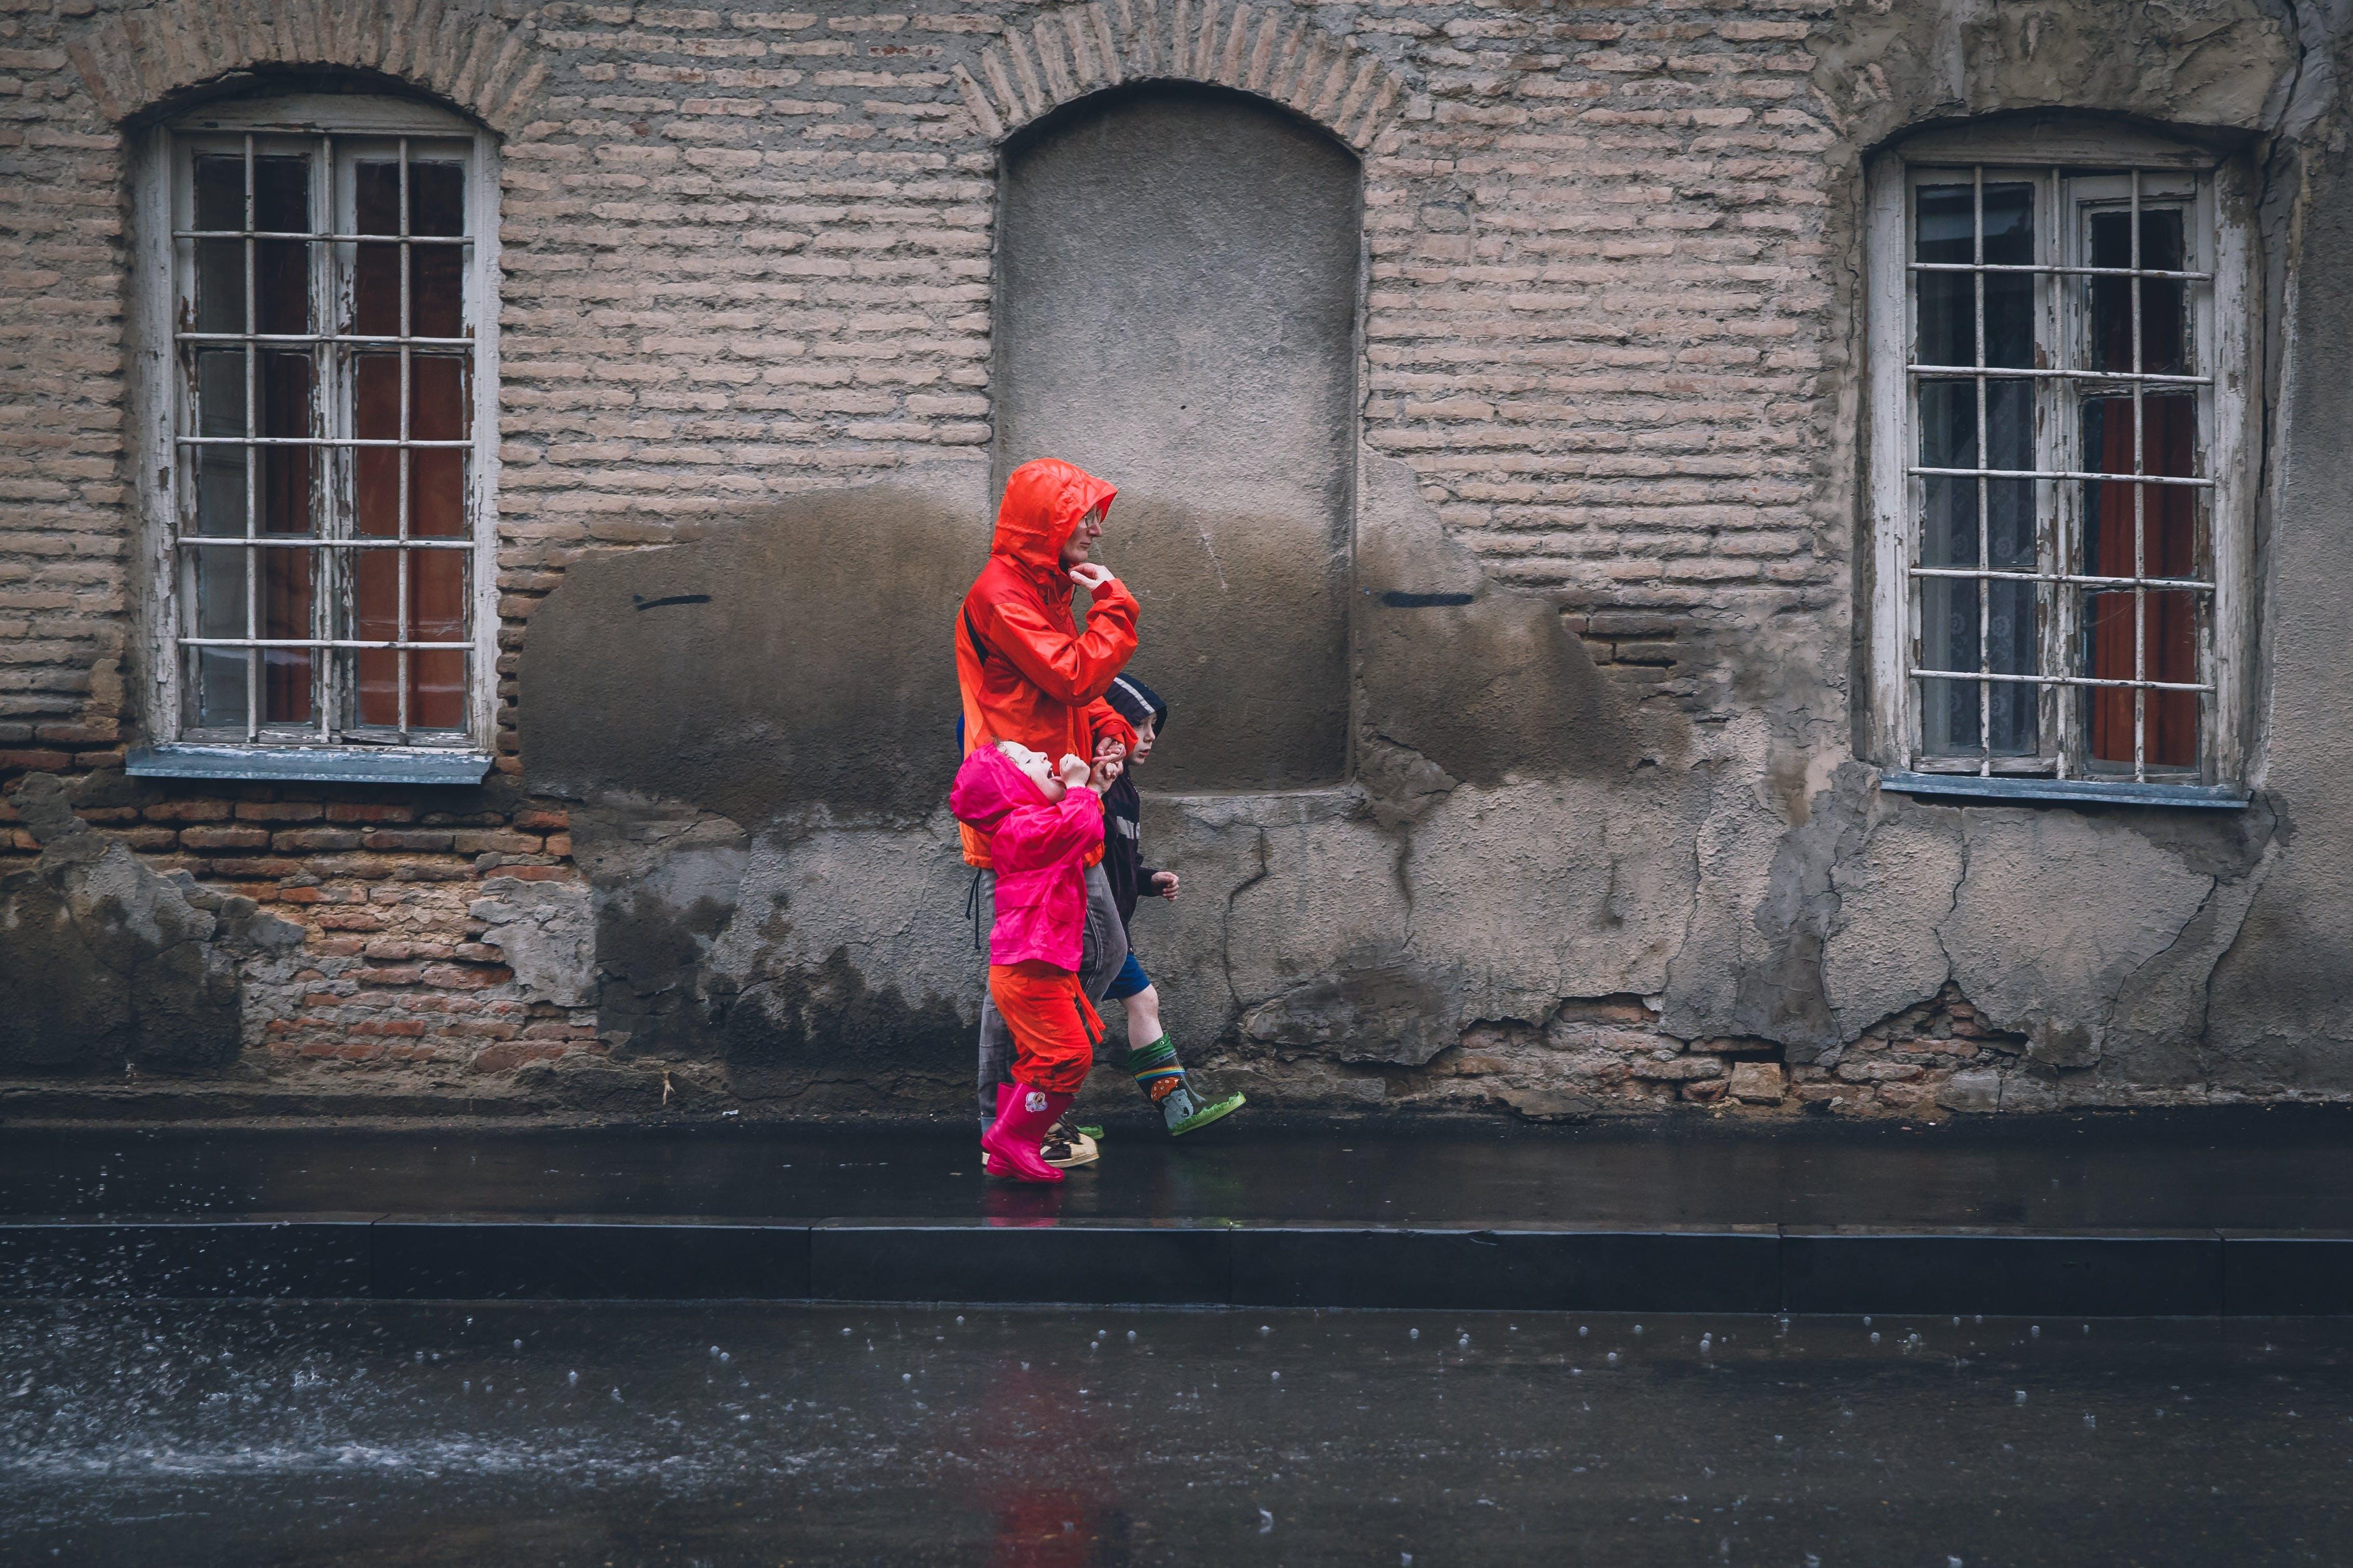 Children and Man Walking on a Sidewalk during Daytime